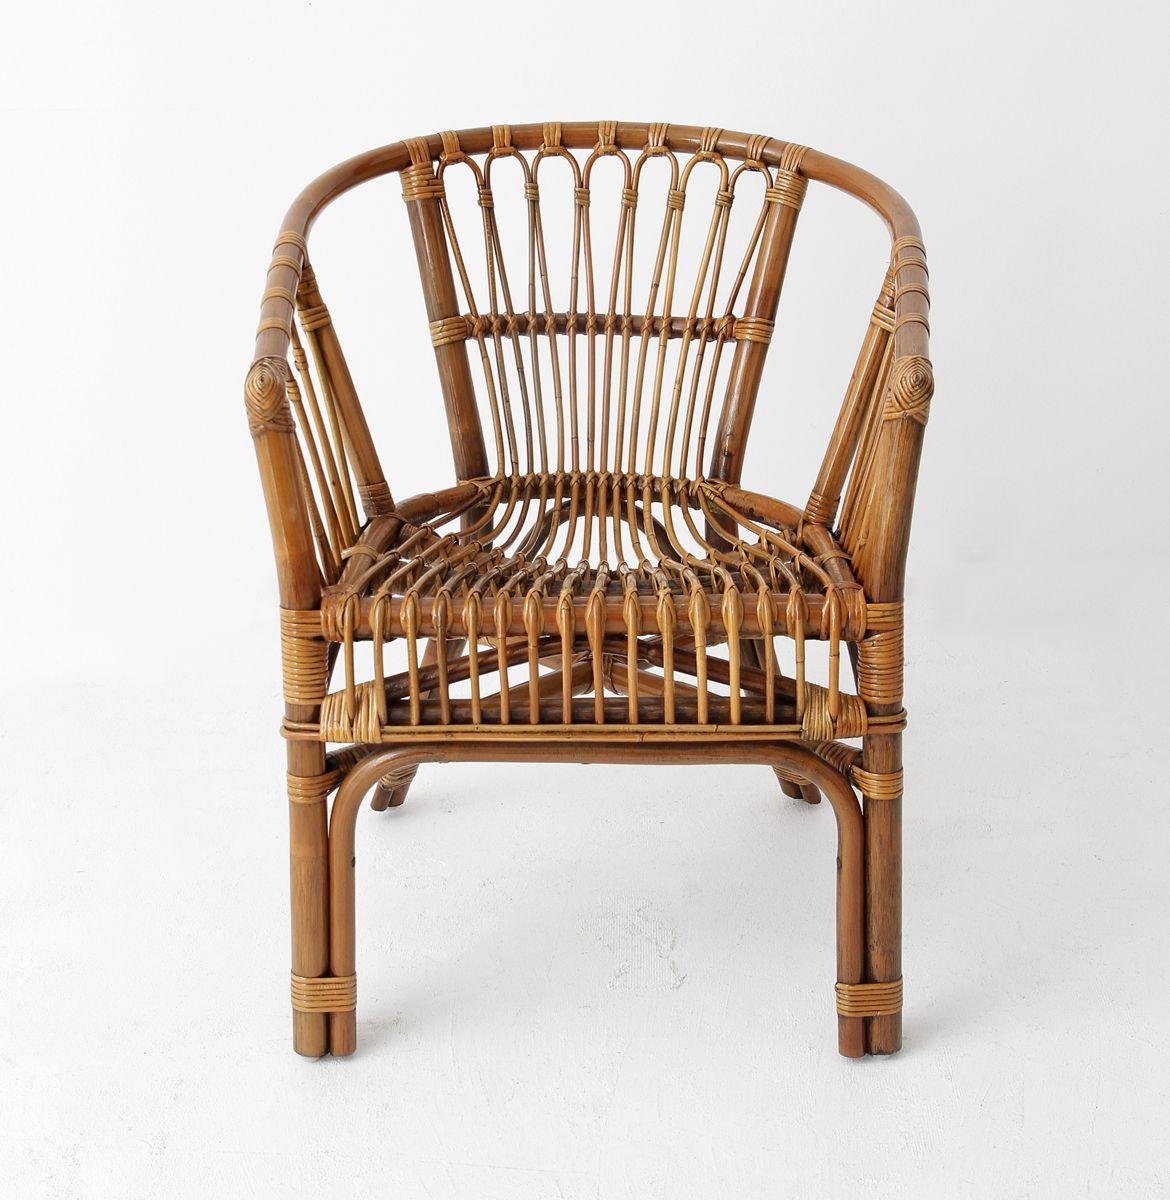 Cape chair no weave chair wicker furniture wicker